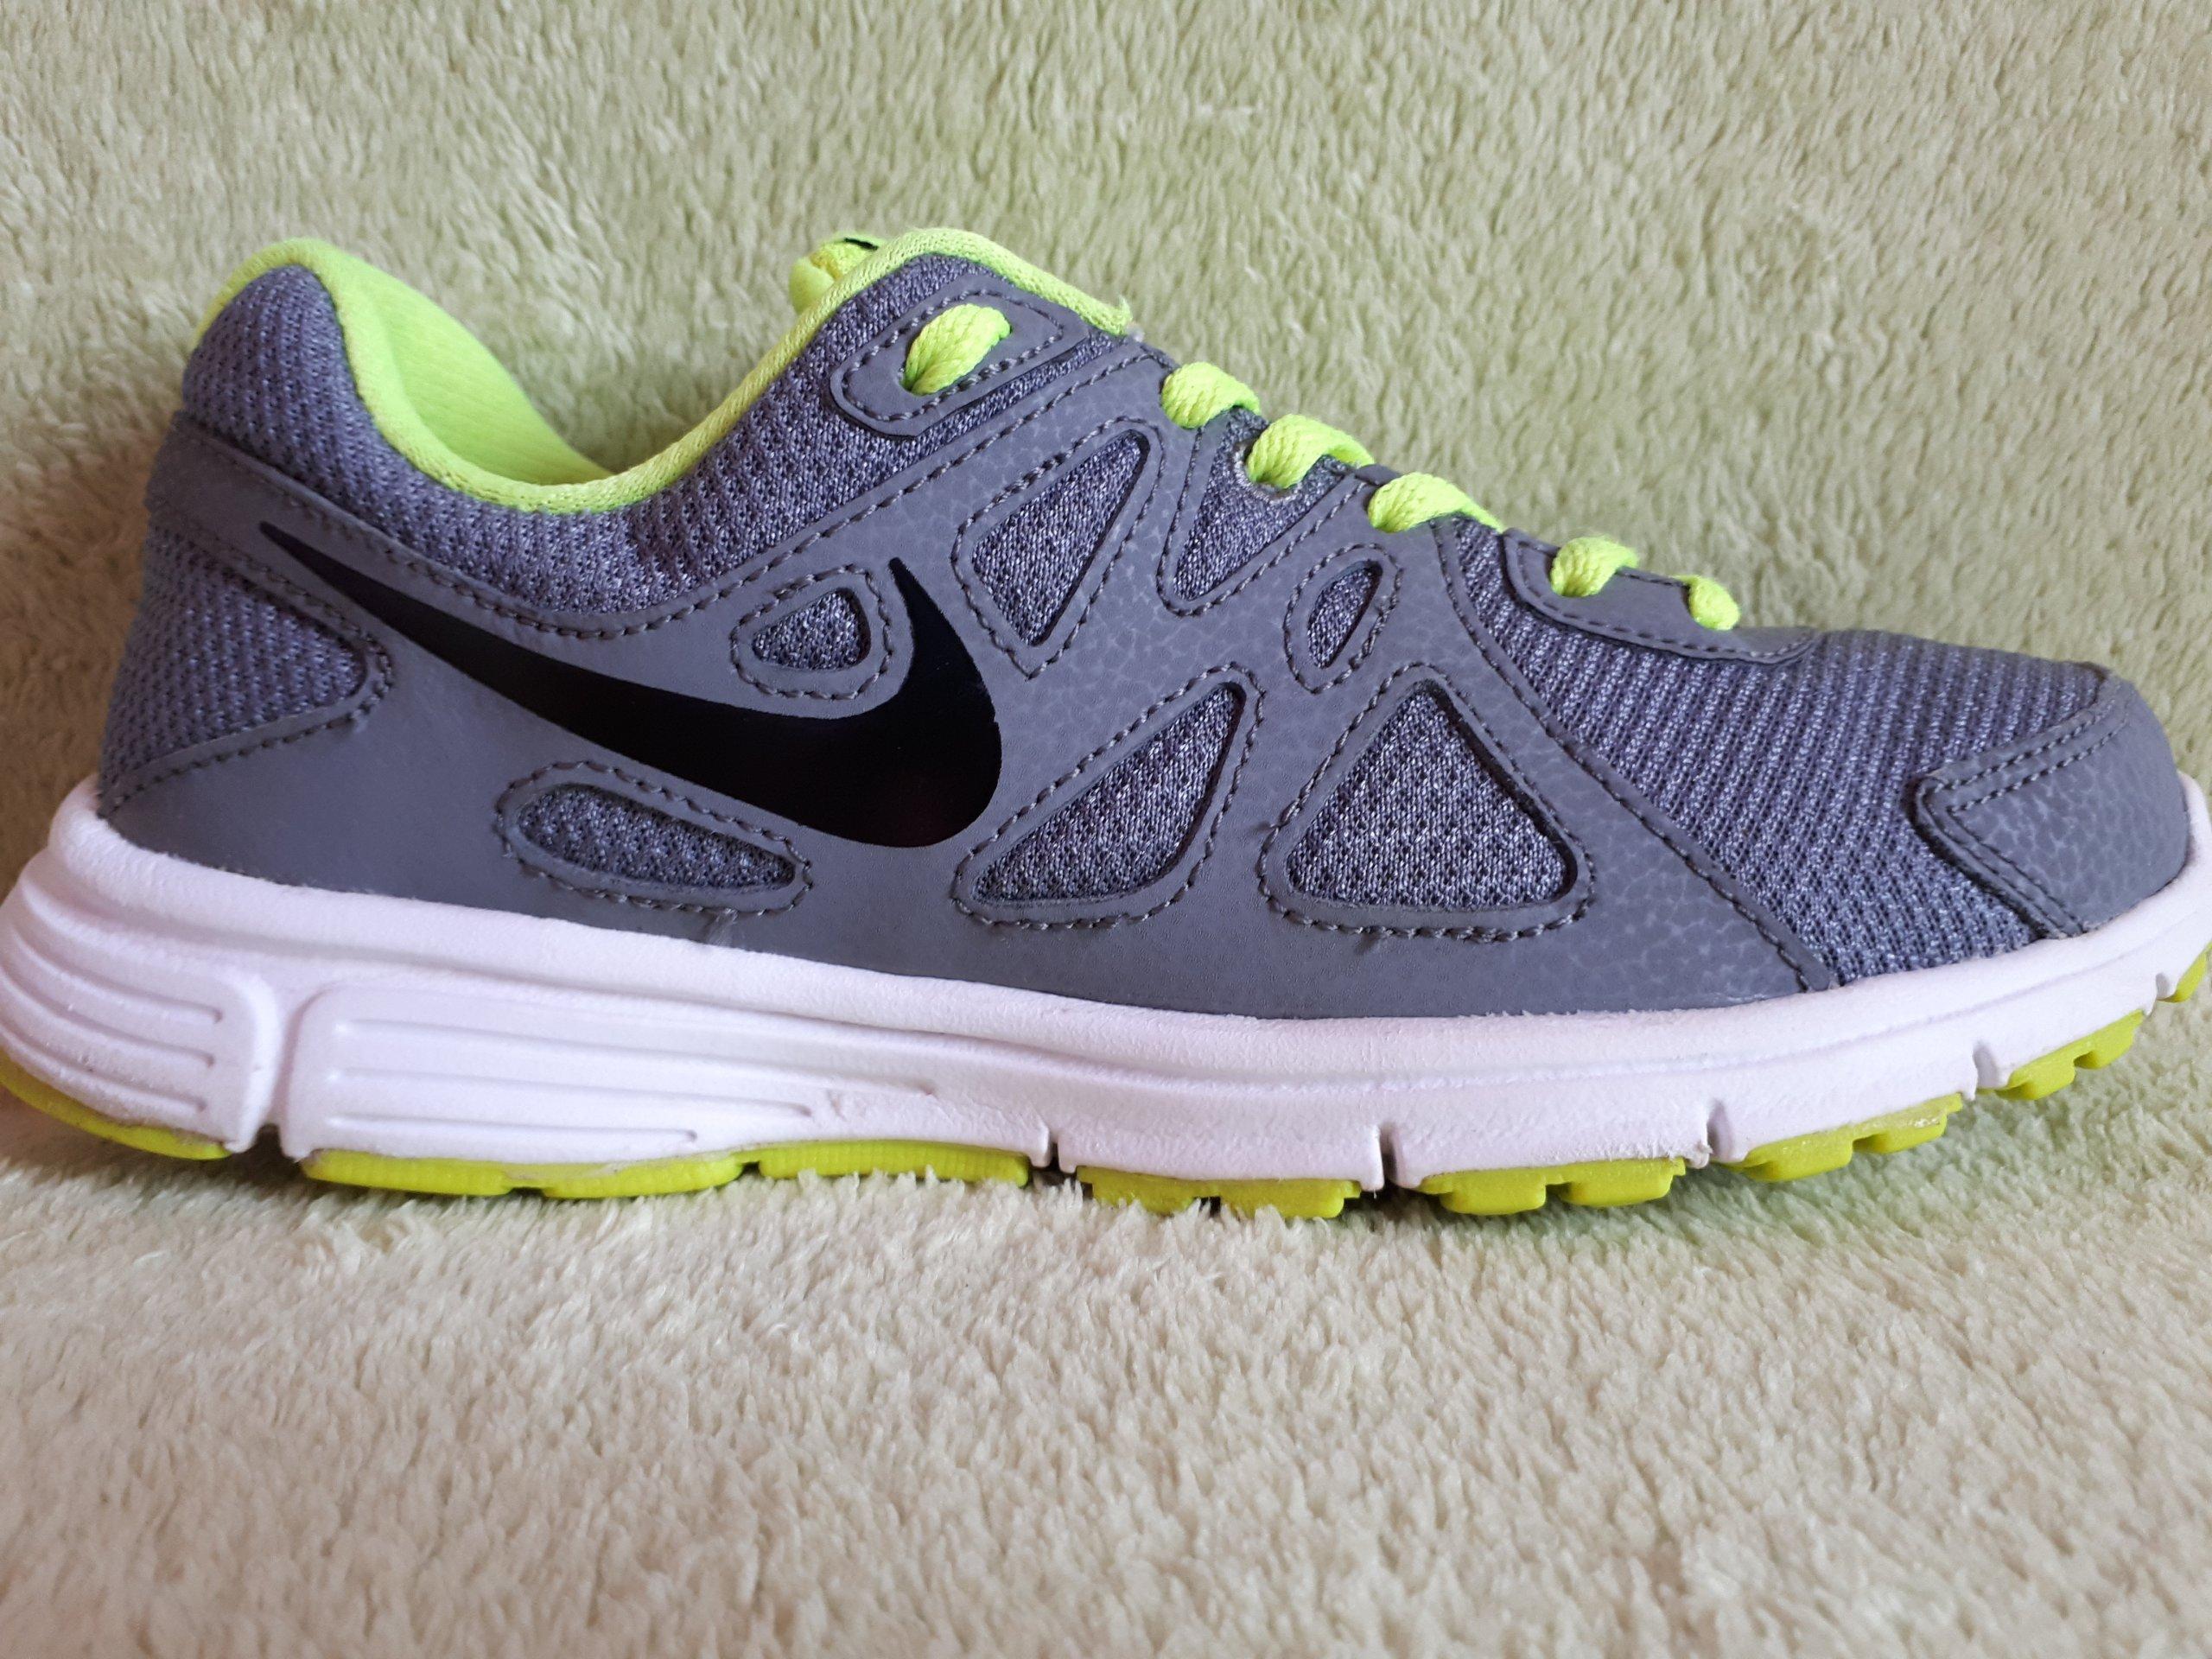 0ab562b38344d NIKE Revolution 2 buty sportowe do biegania r 38 - 7408663585 ...